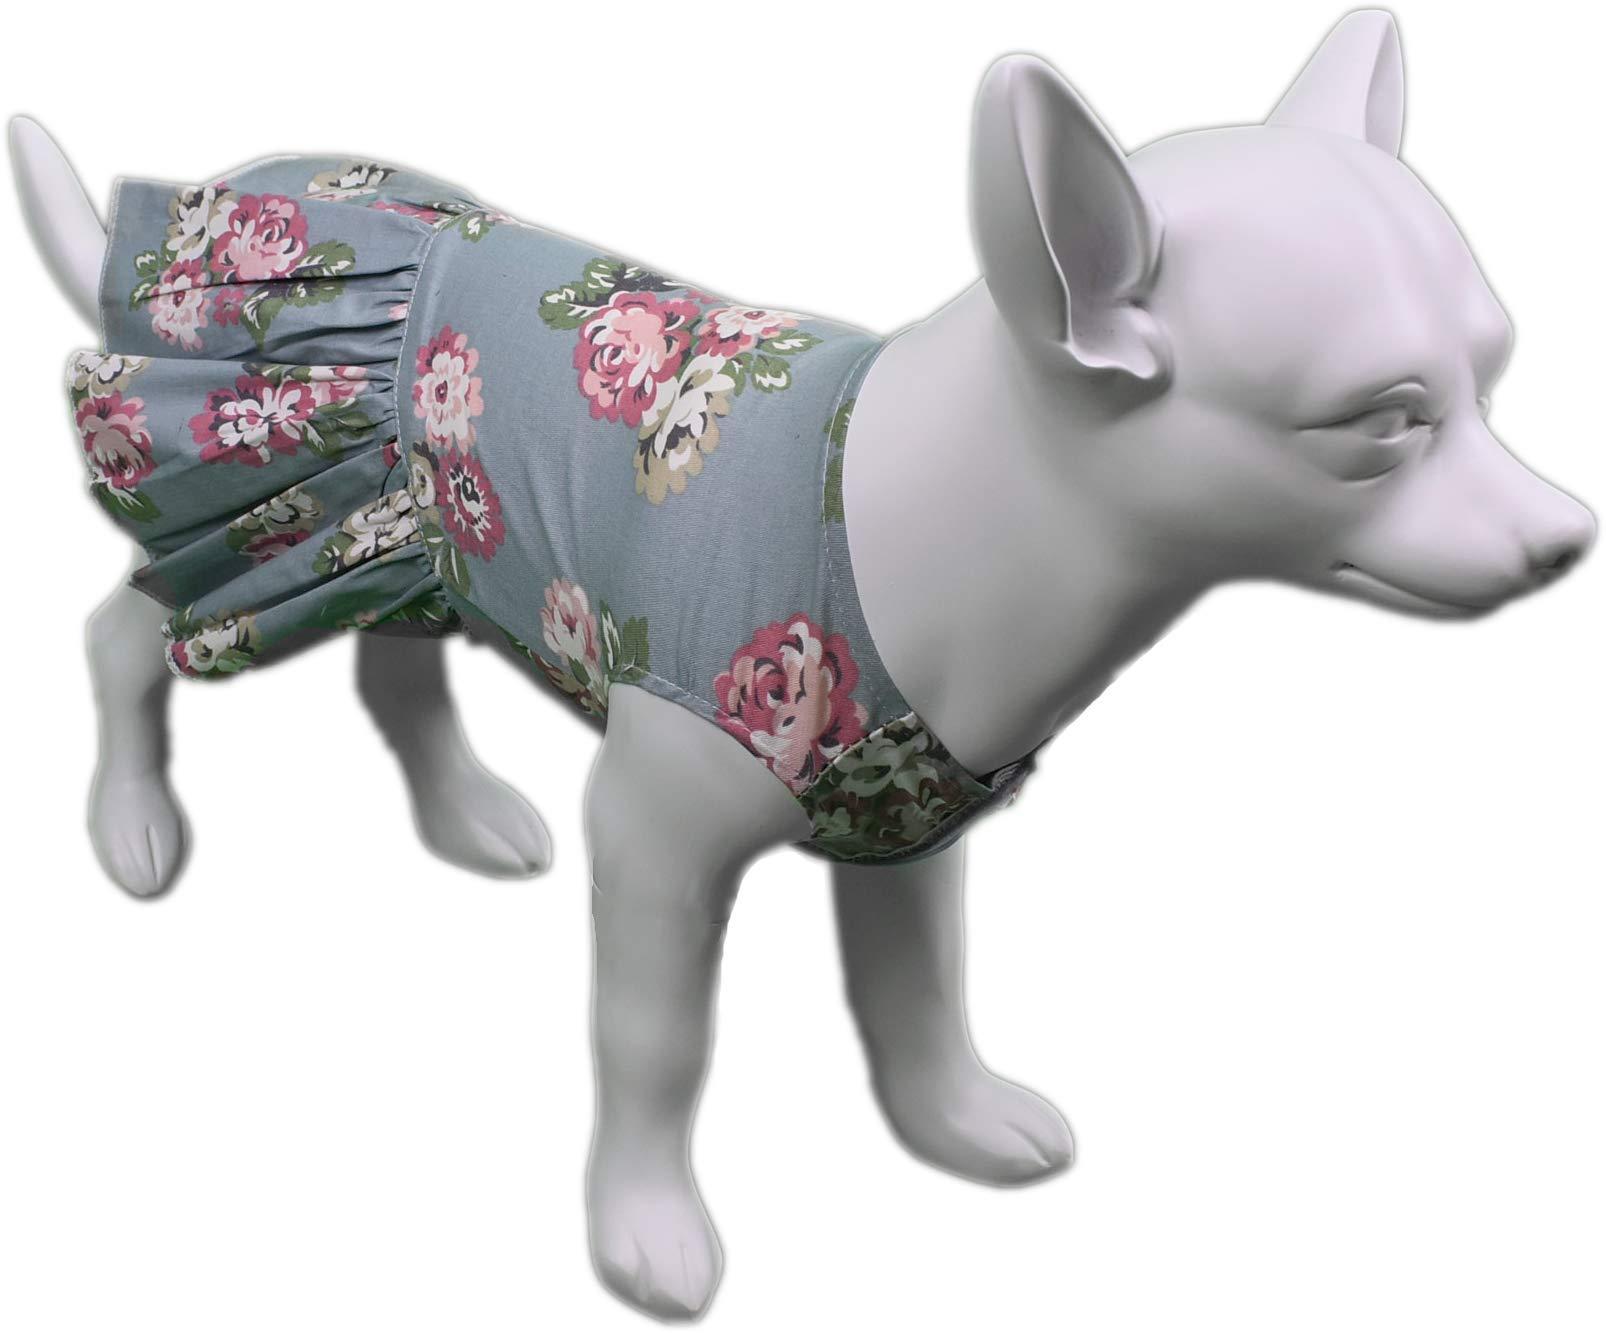 Flower Print Dog Dress in Blue (X-Small)